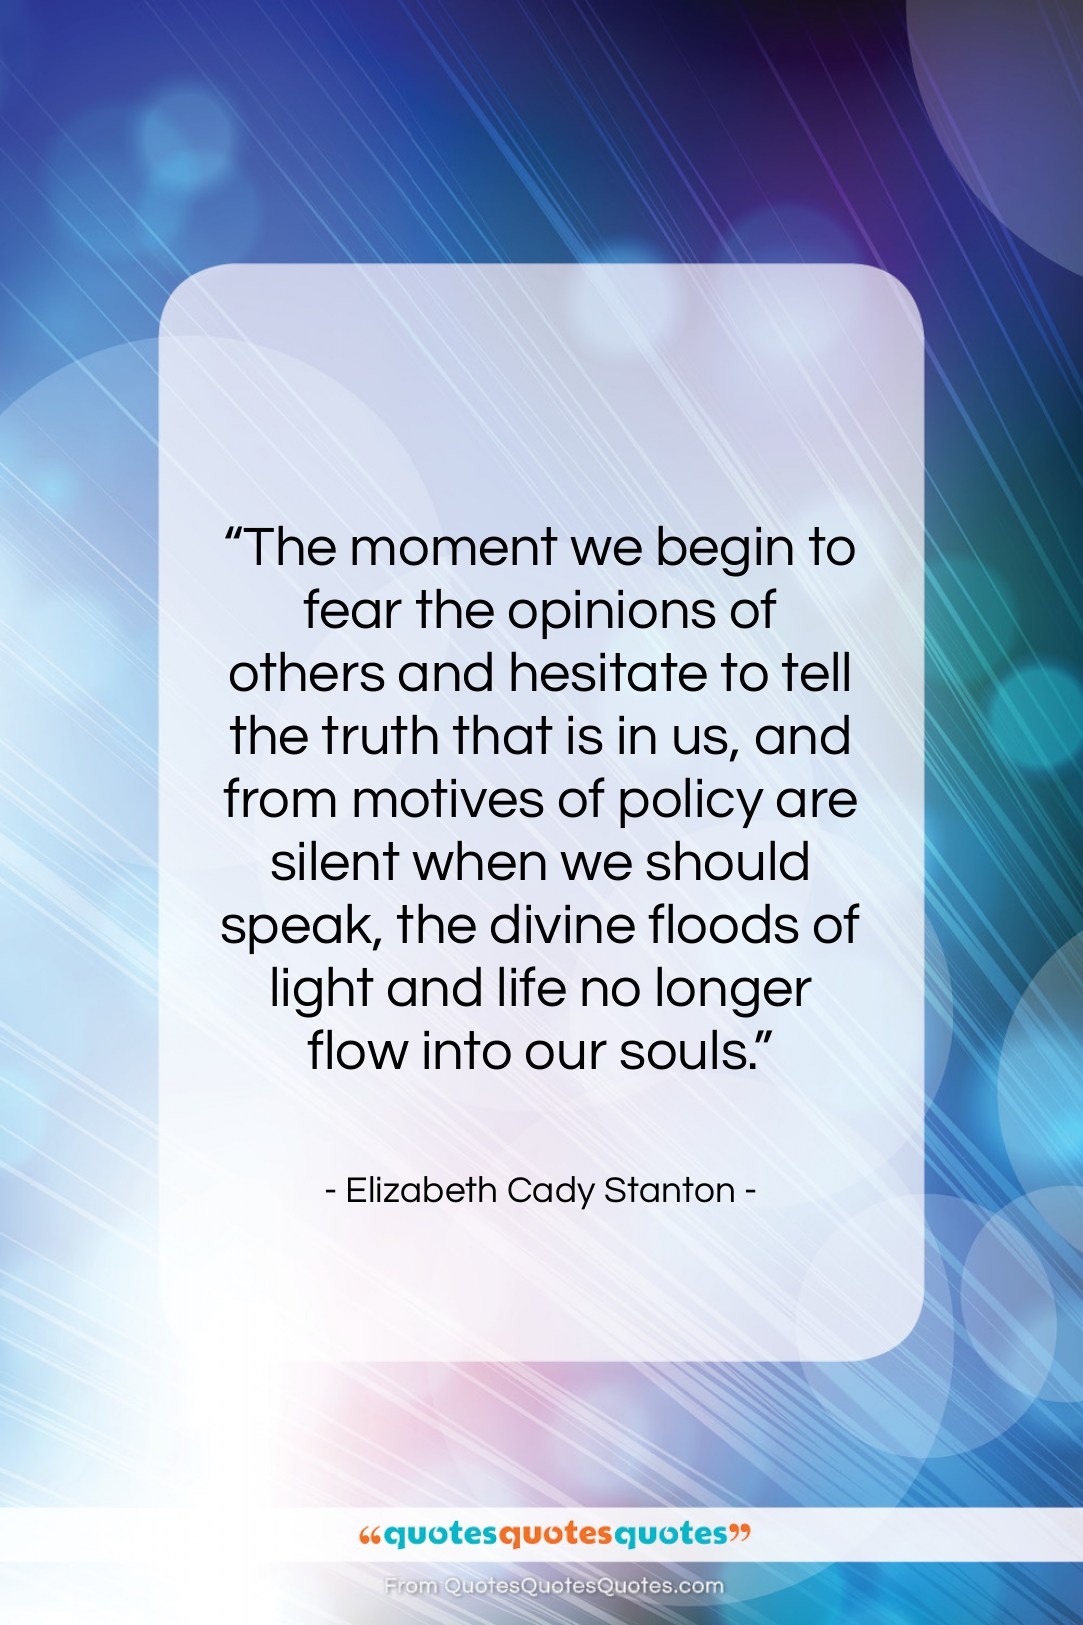 Get the whole Elizabeth Cady Stanton quote: \